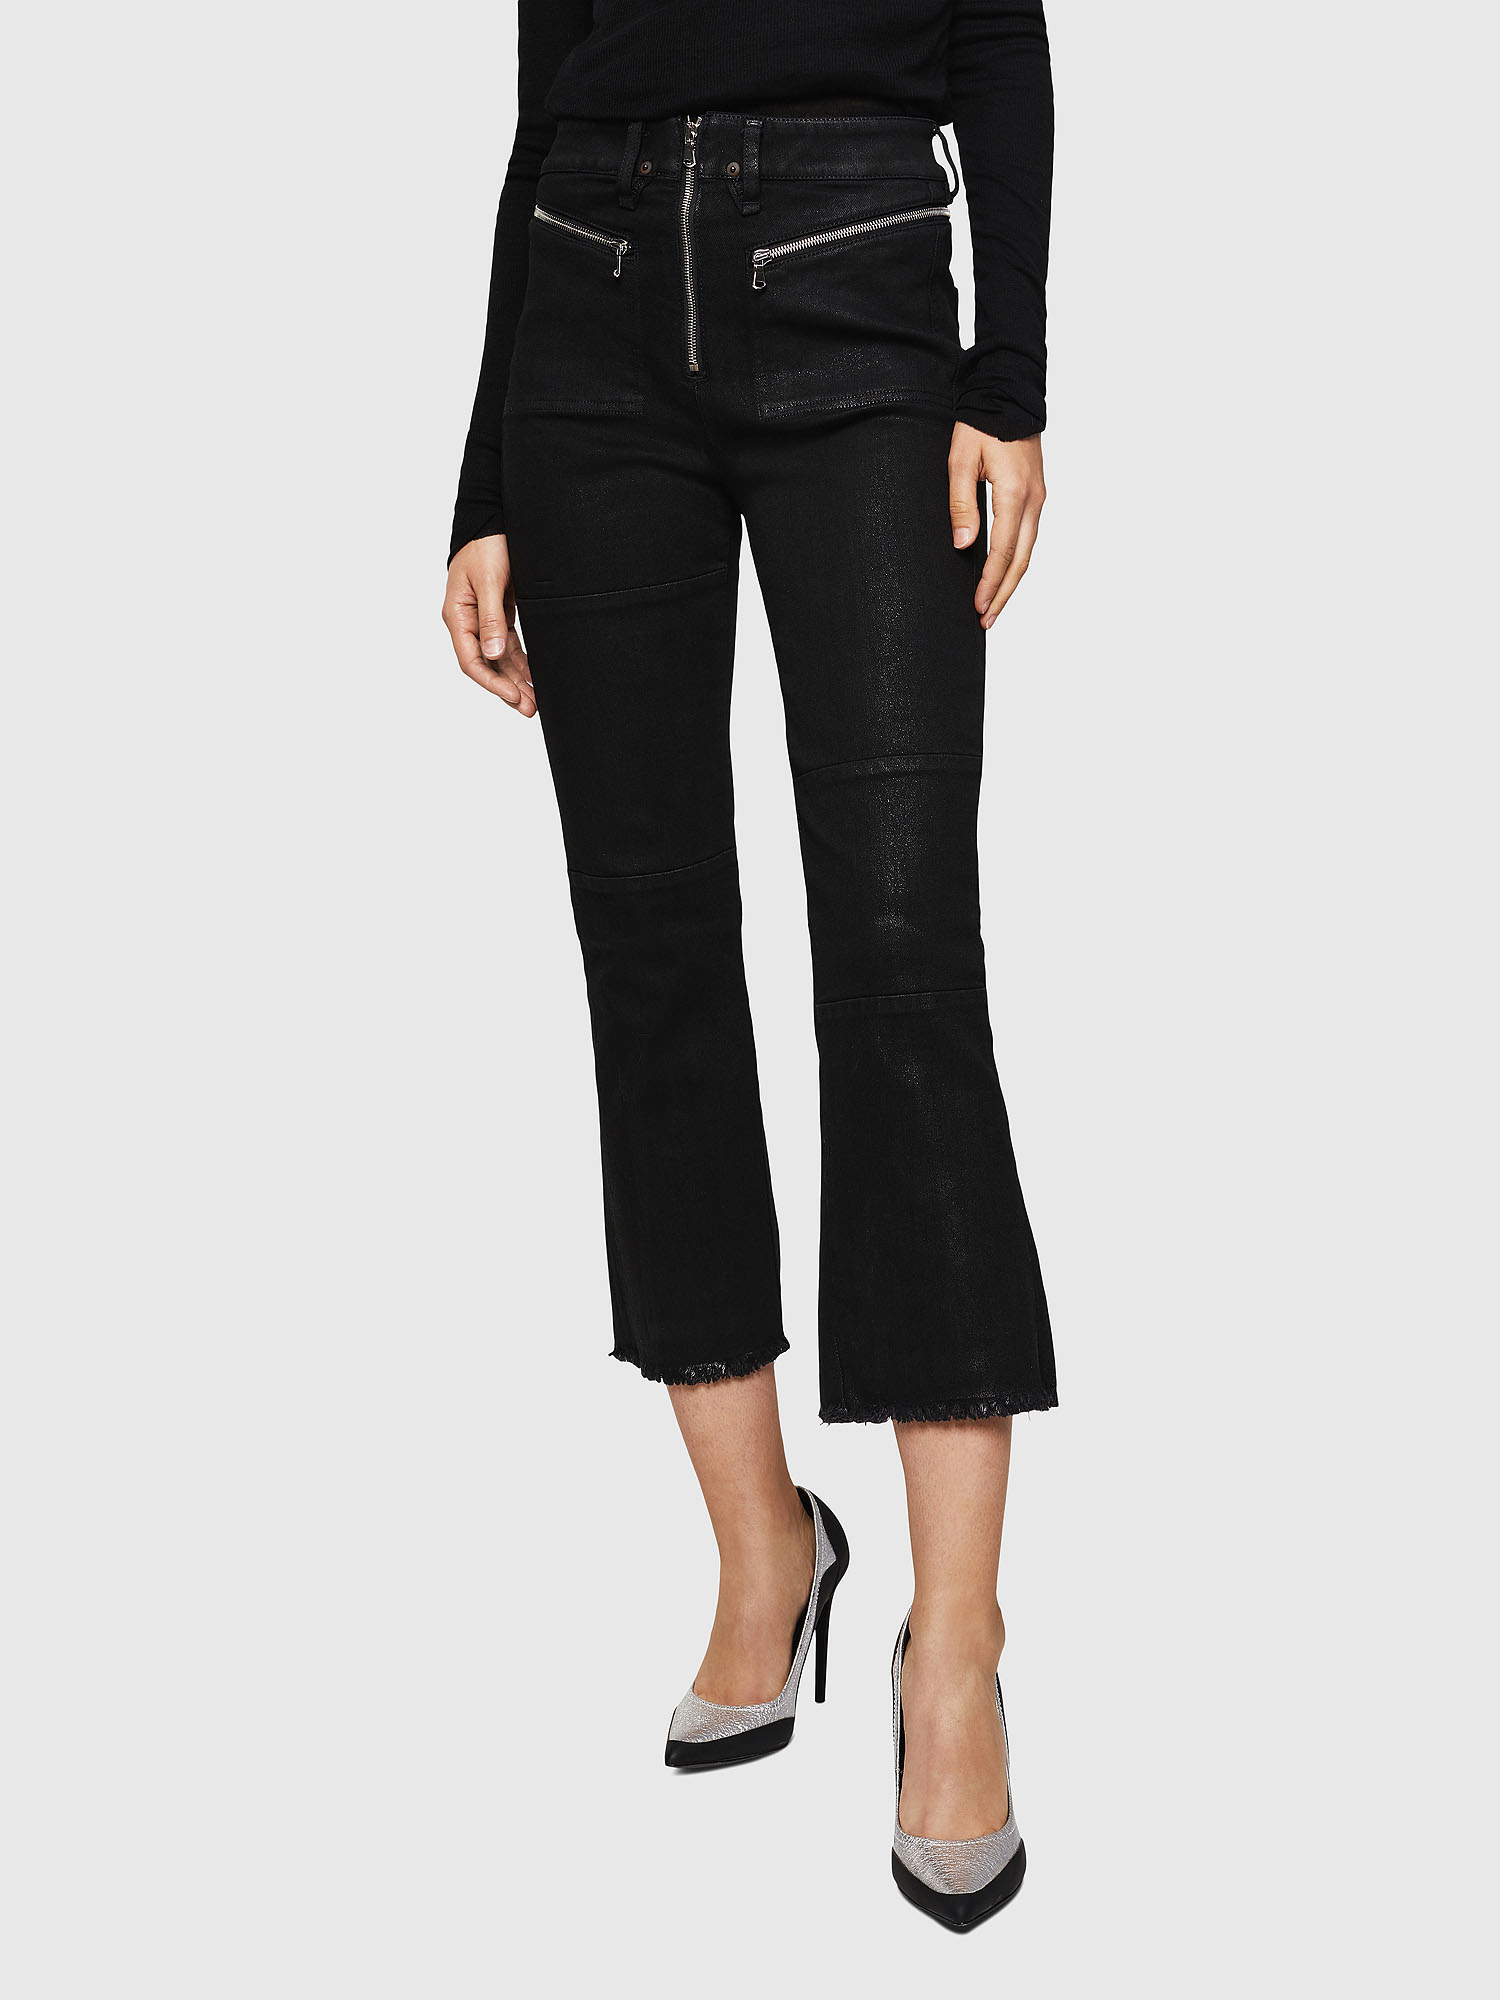 TYPE-1909 Women: Coated jeans with zip details | Diesel